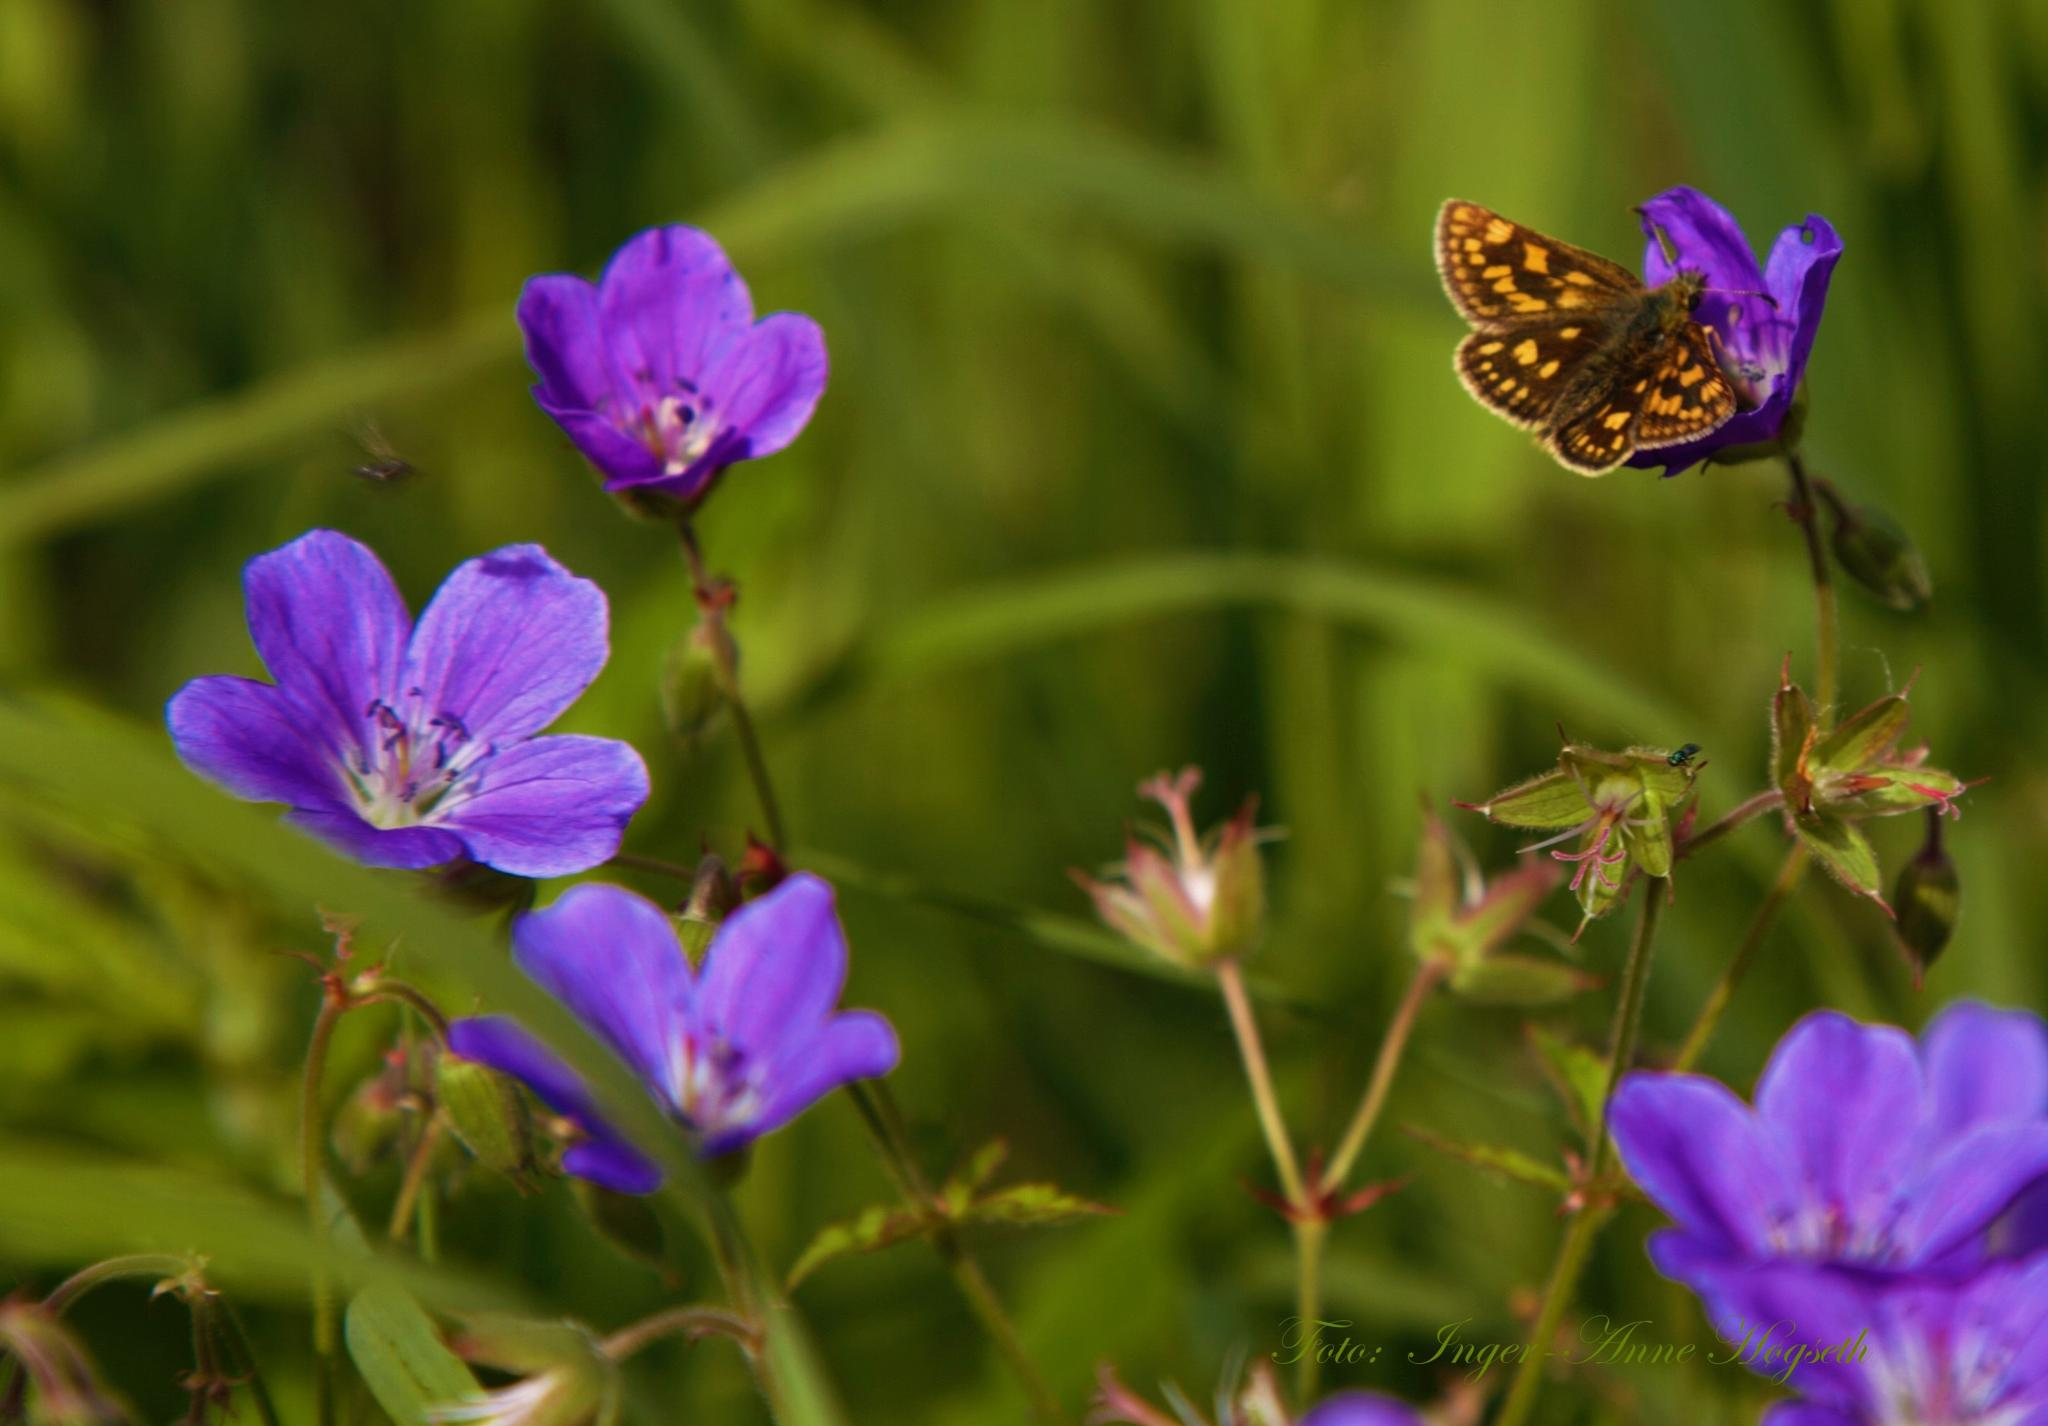 Butterfly by IngerAnneHogseth